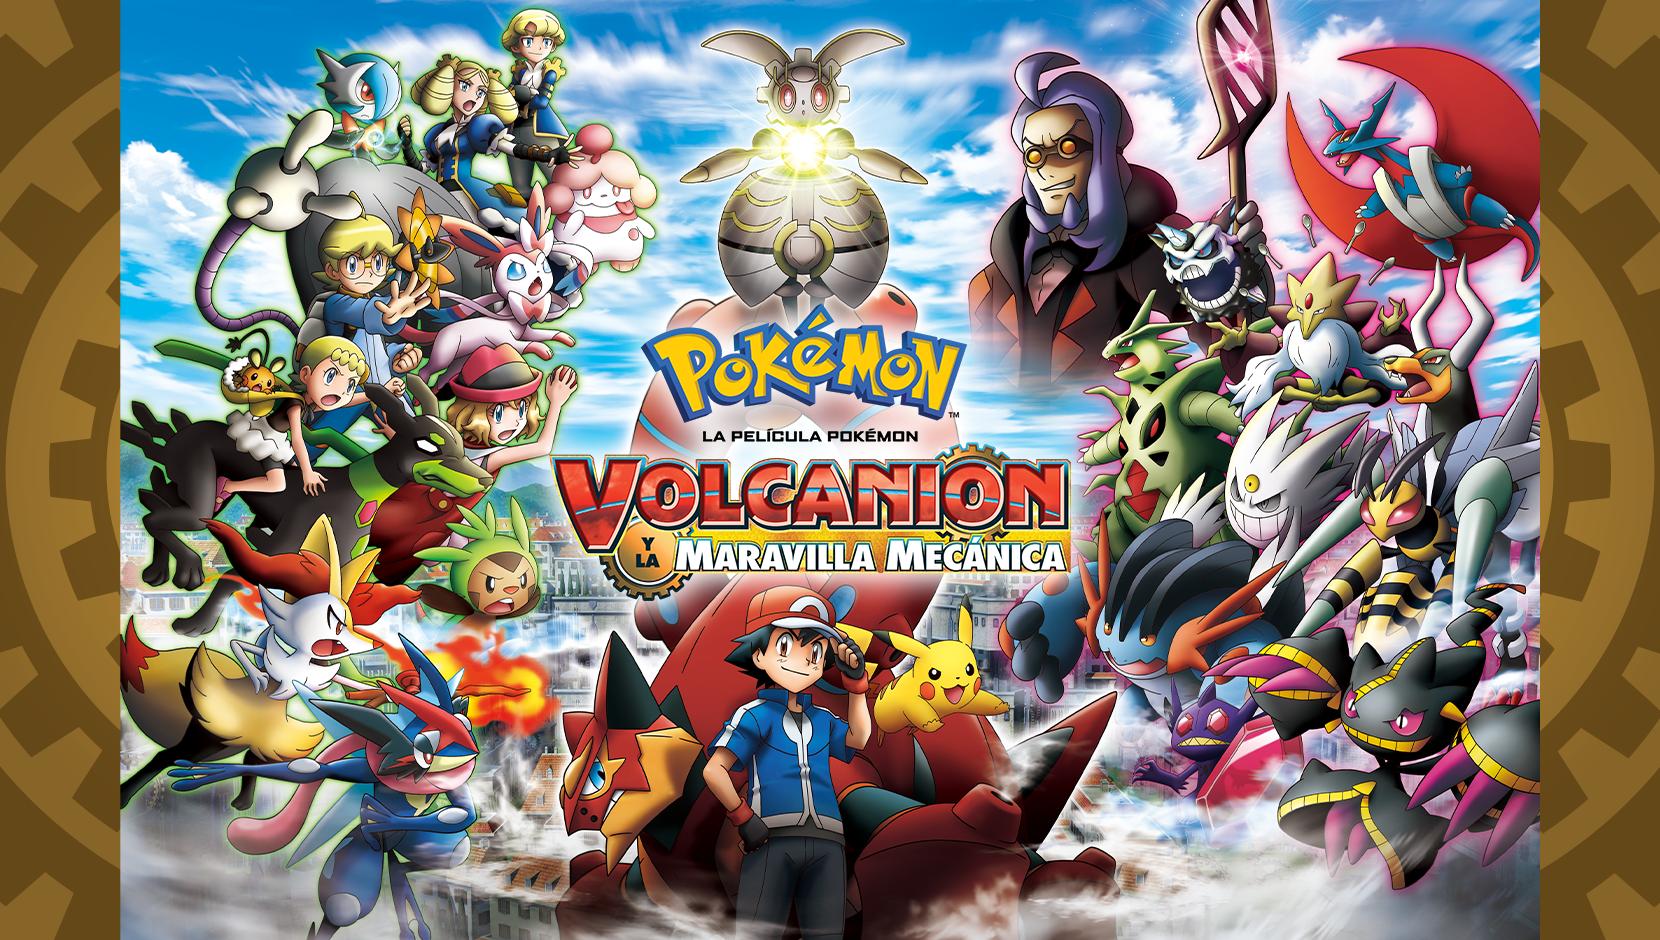 TV Pokémon: Volcanion y la maravilla mecánica